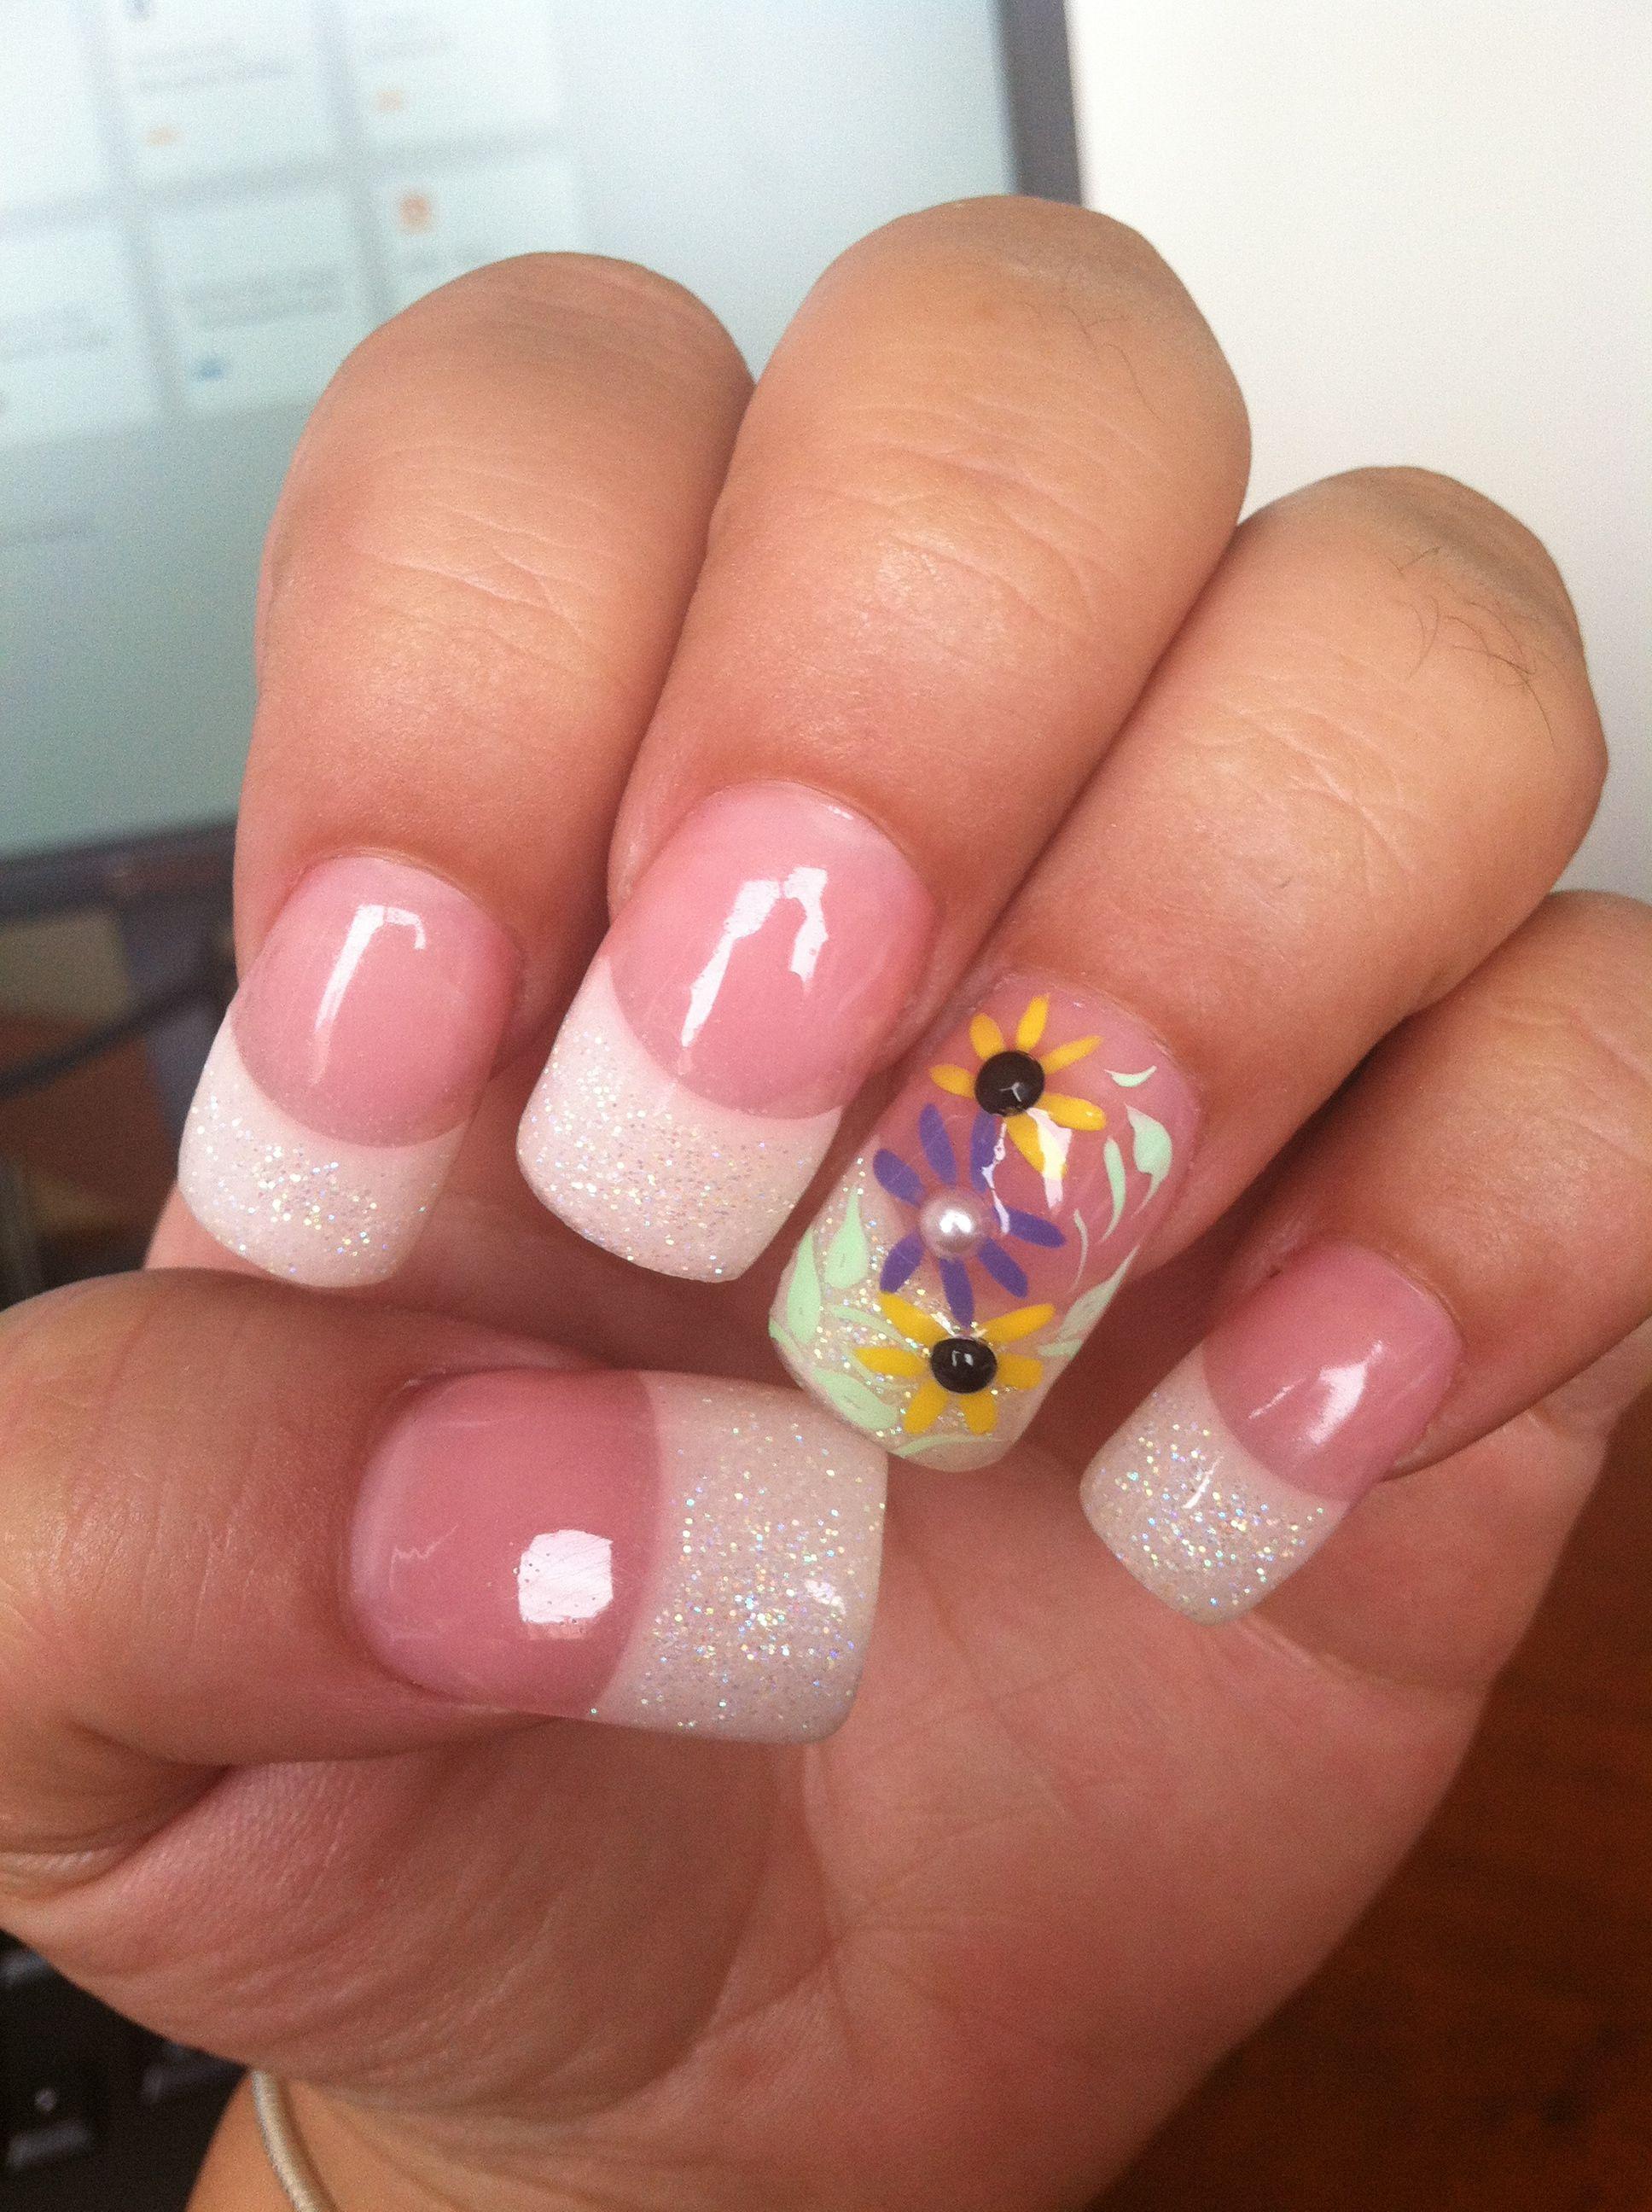 Daisy Nail Design | Daisy nails, Nail designs, Nails